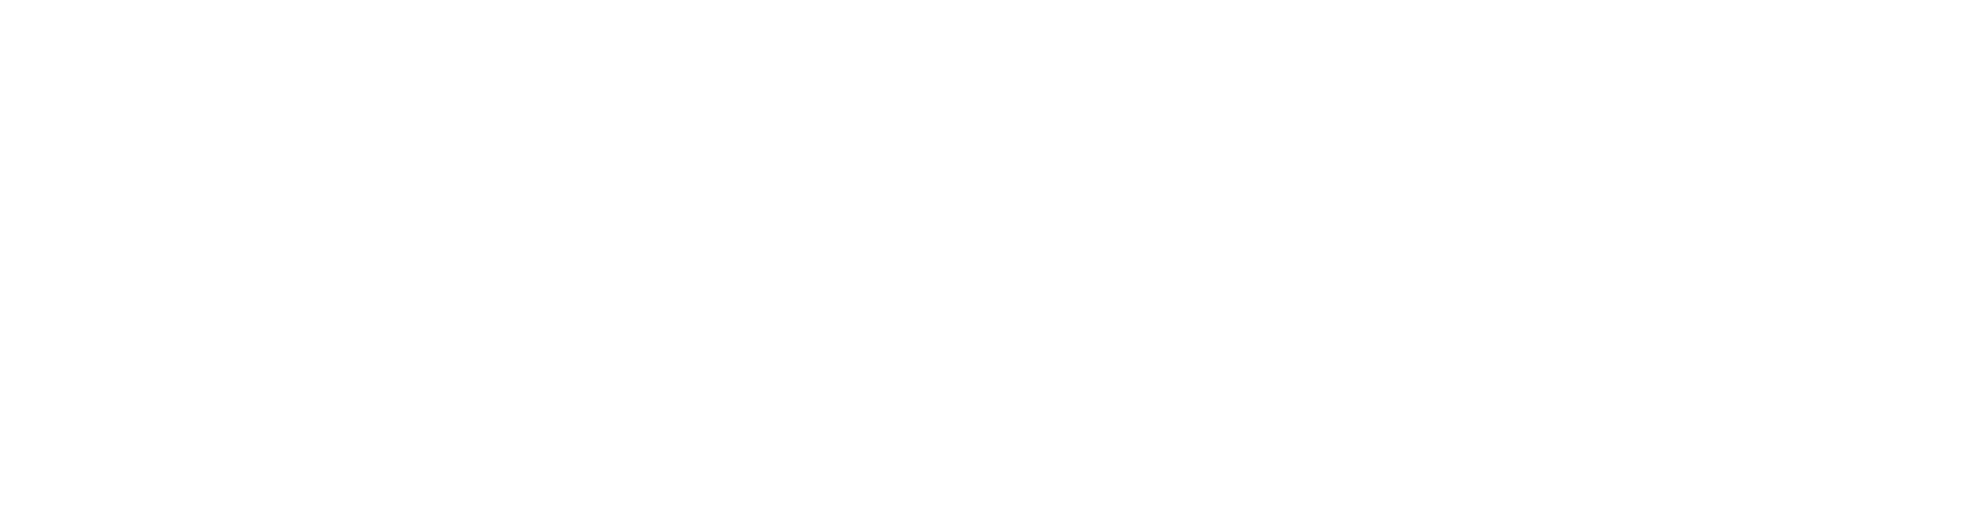 Ellae Jobs